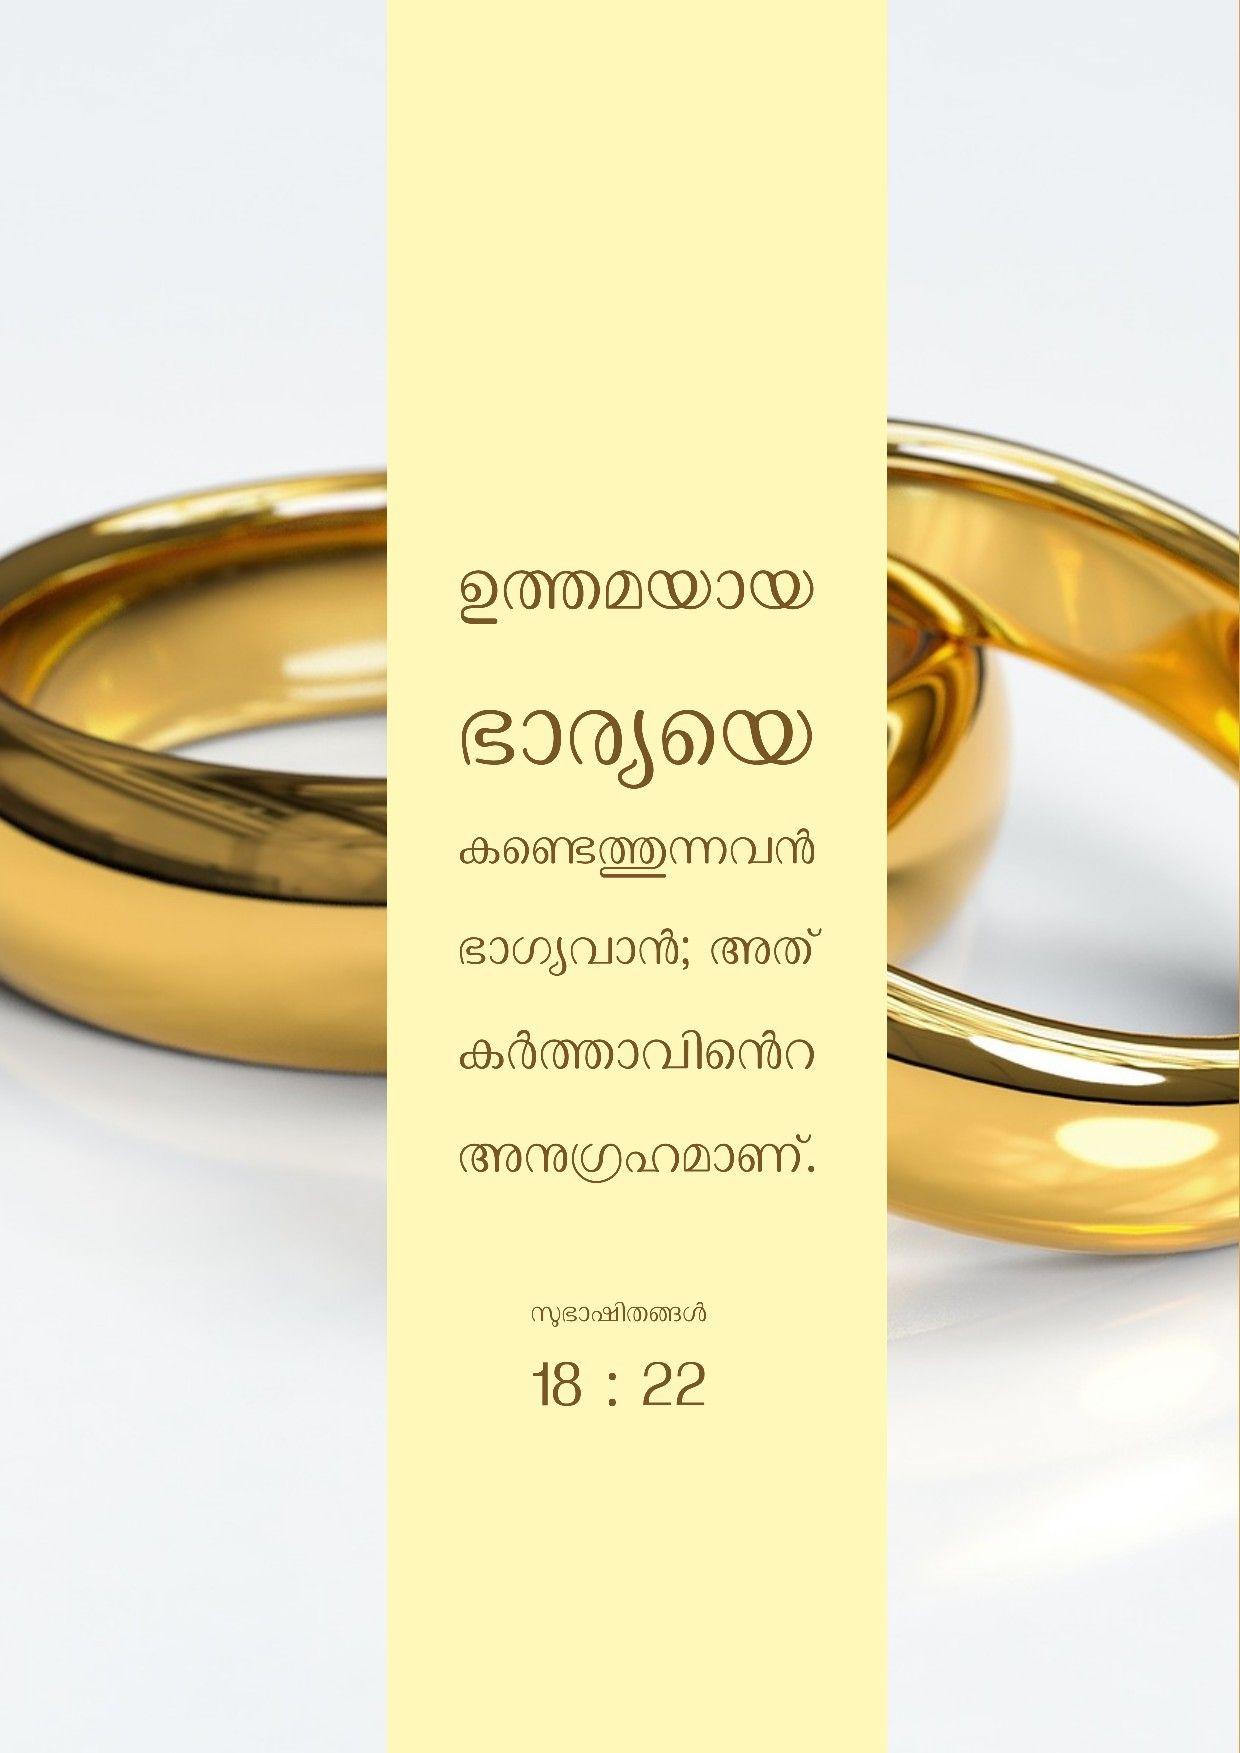 Pin by jubi MecH on Feelings in 2020 Engagement rings